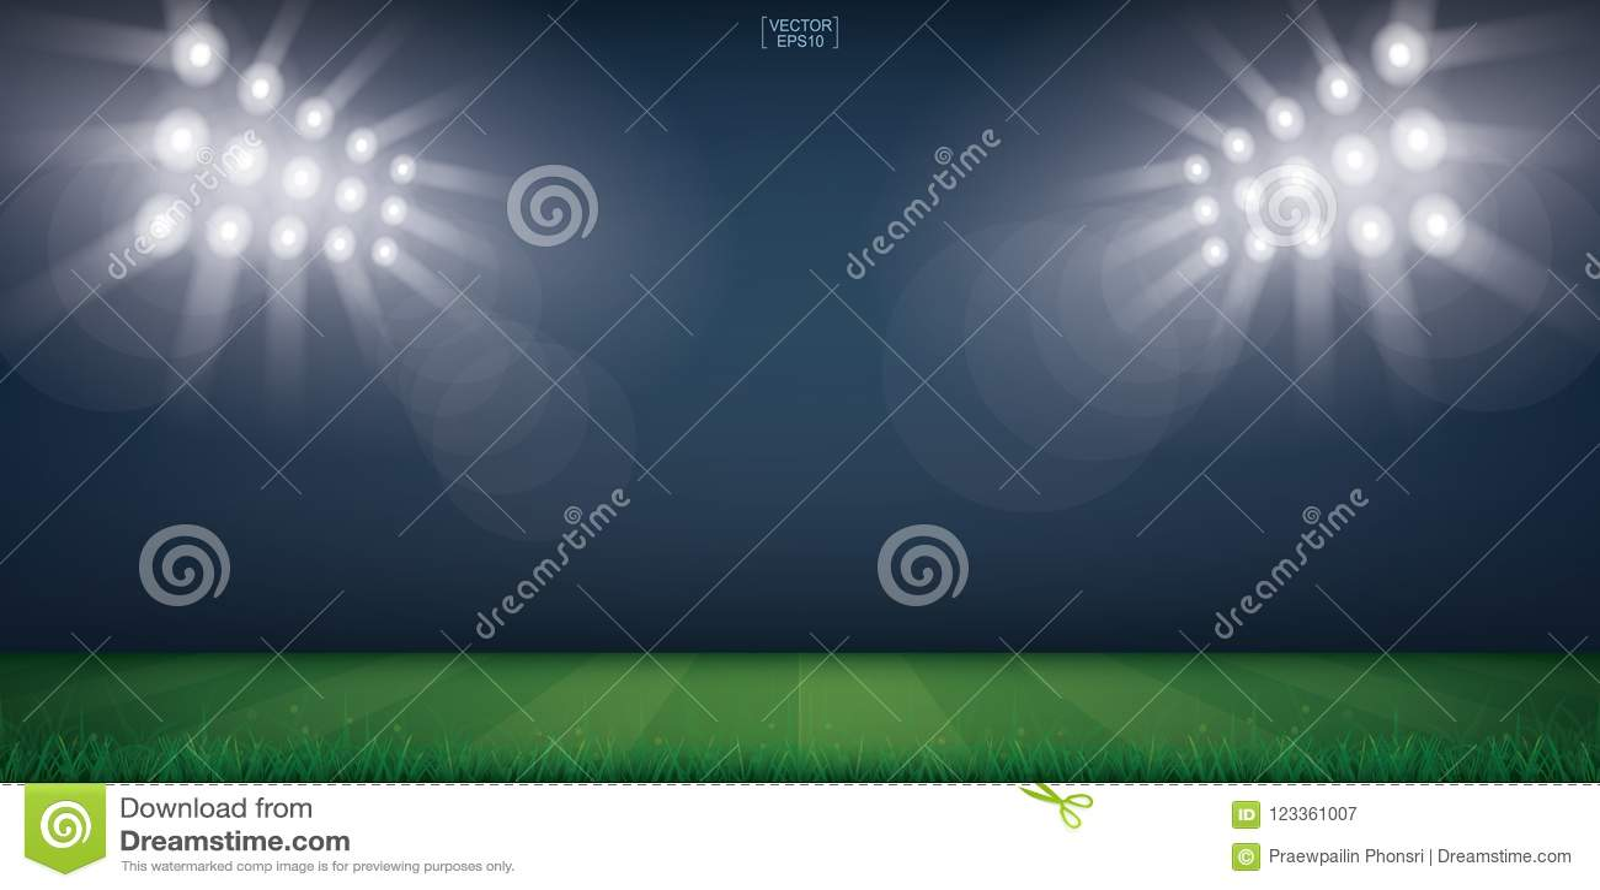 football field or soccer field stadium background vector stock vector illustration of brazil green 123361007 https www dreamstime com football field soccer stadium background vector illustration image123361007